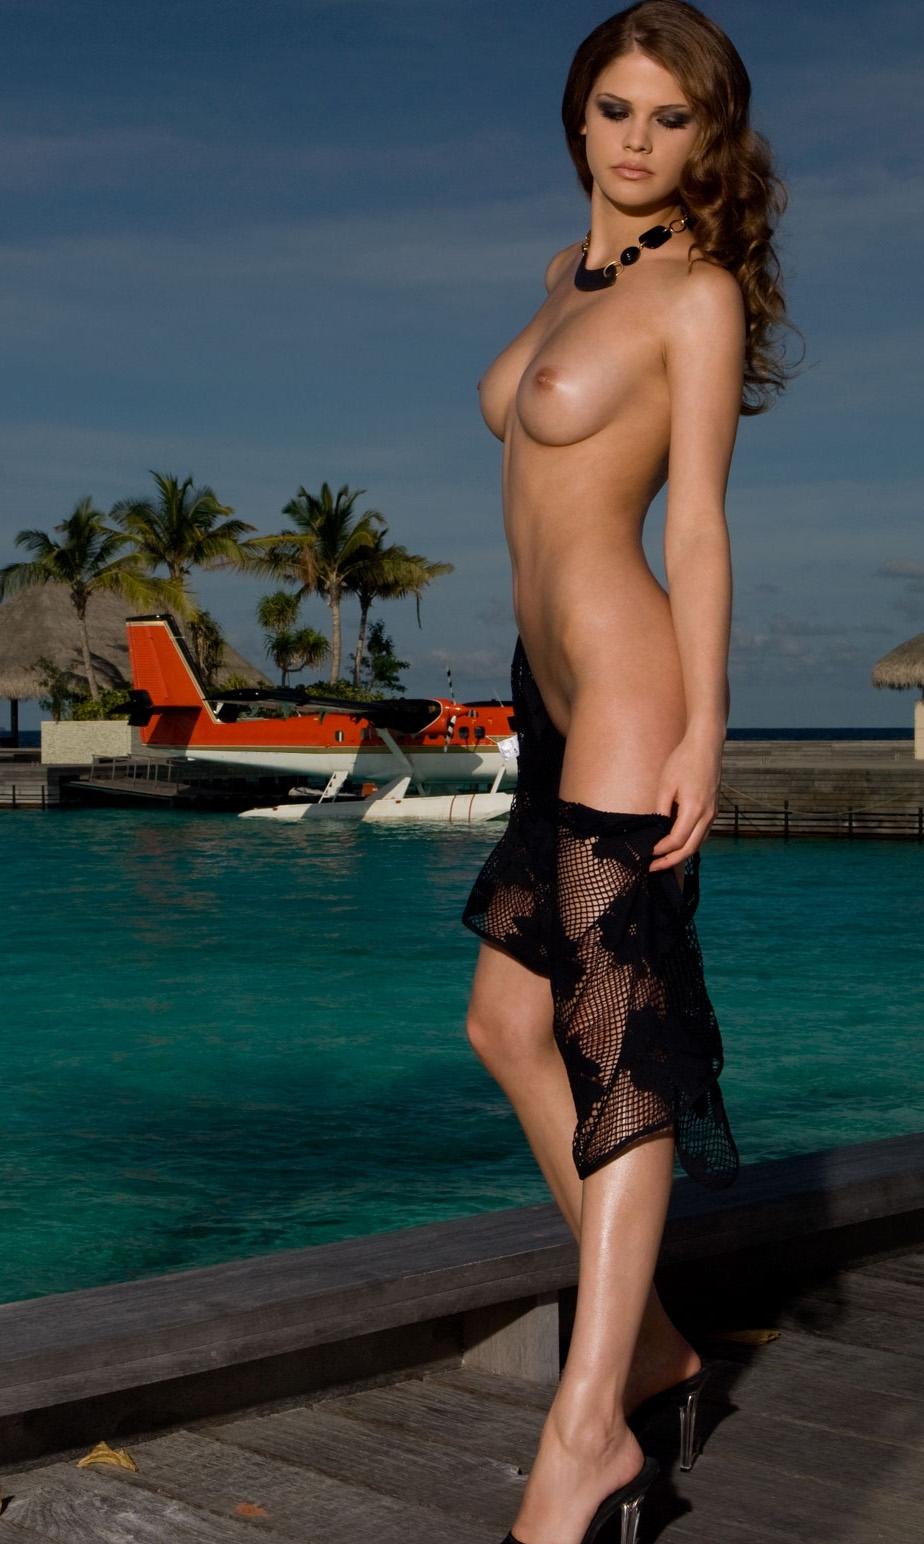 lisa-tomaschewski-nude-xxx-pakistanis-neud-images